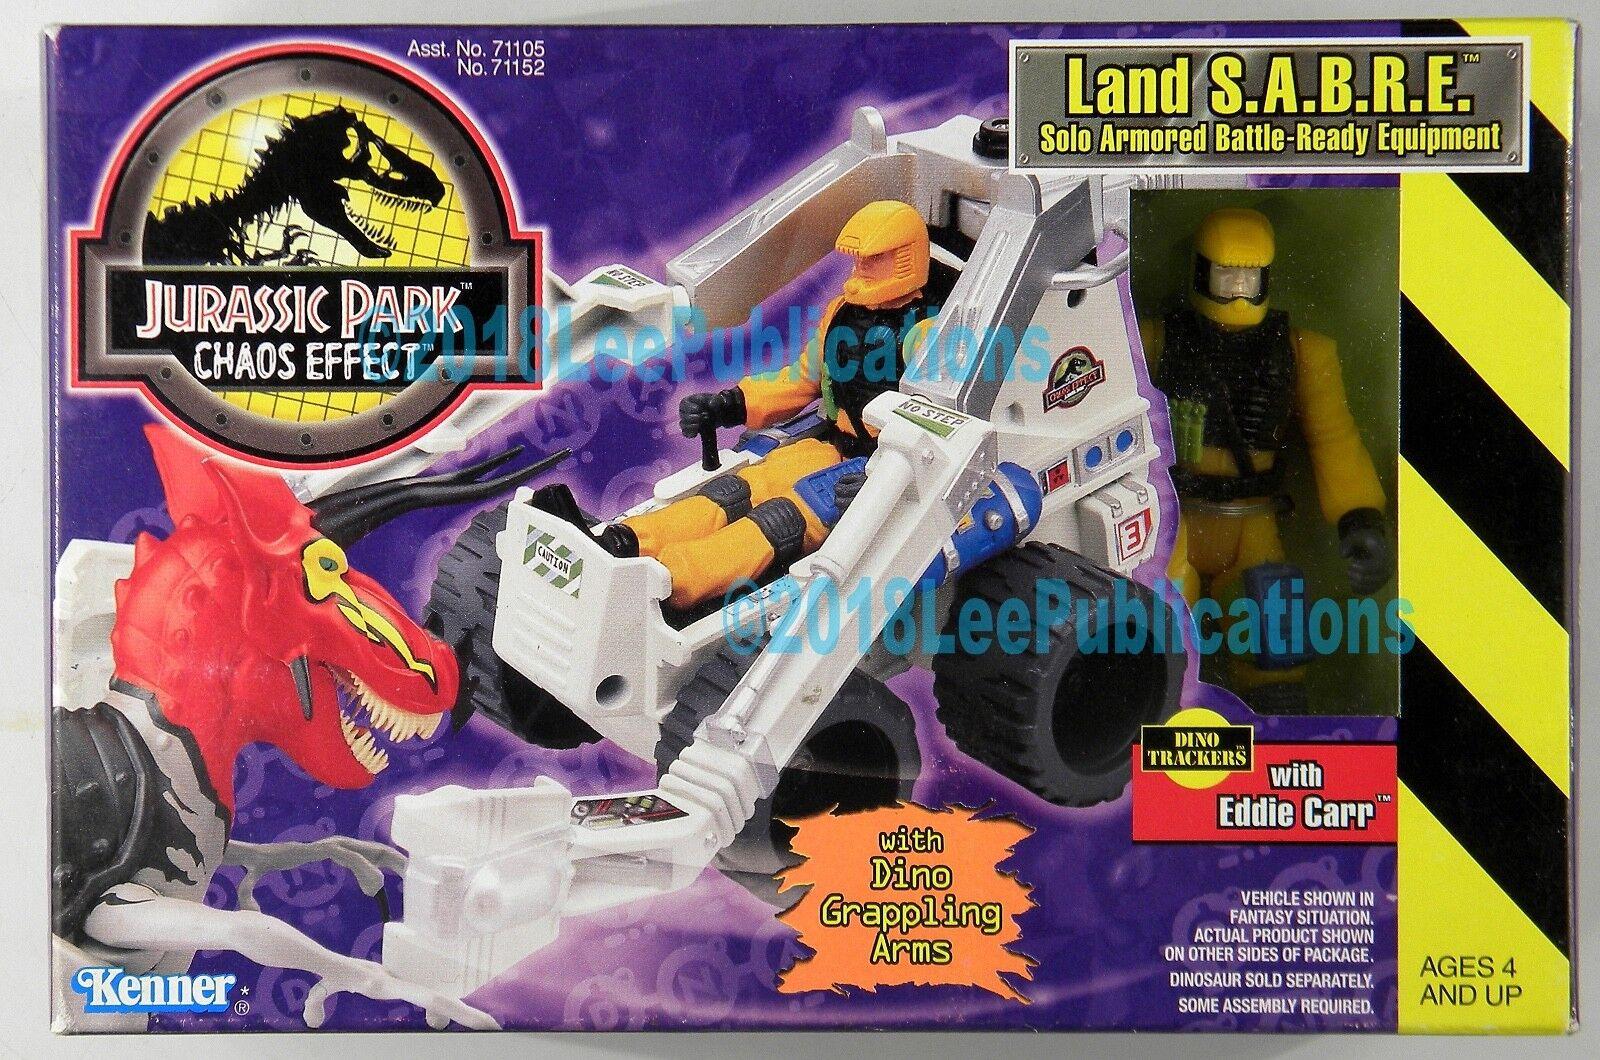 Kenner Jurassic Park Park Park Dinosaur Land S.A.B.R.E. MISB rare c-9 Sabre Chaos Effect 9592b5